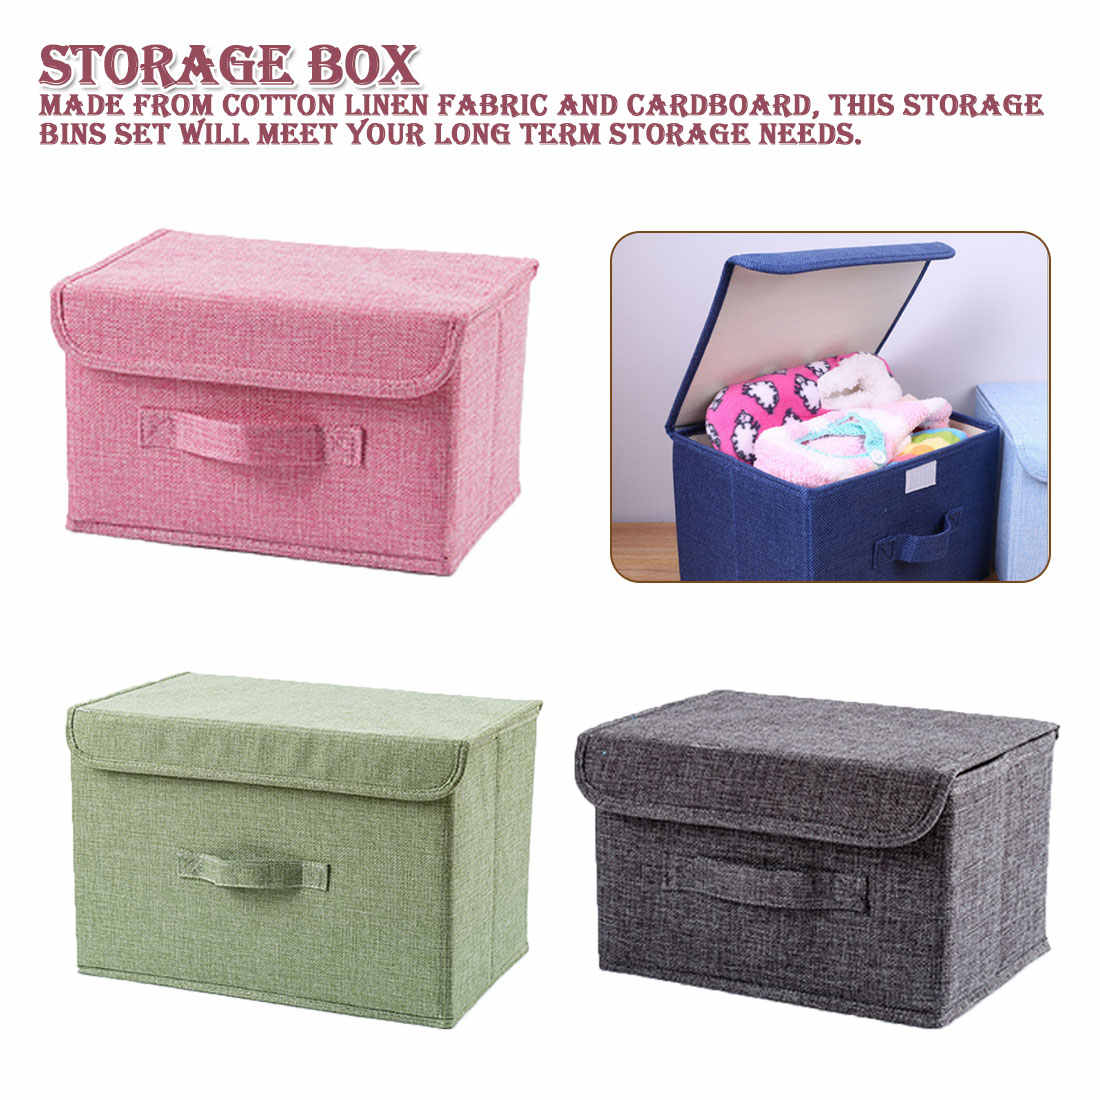 Large Folding Storage Box Cotton Linen Fabric Kids Toys Organizer Container Bins